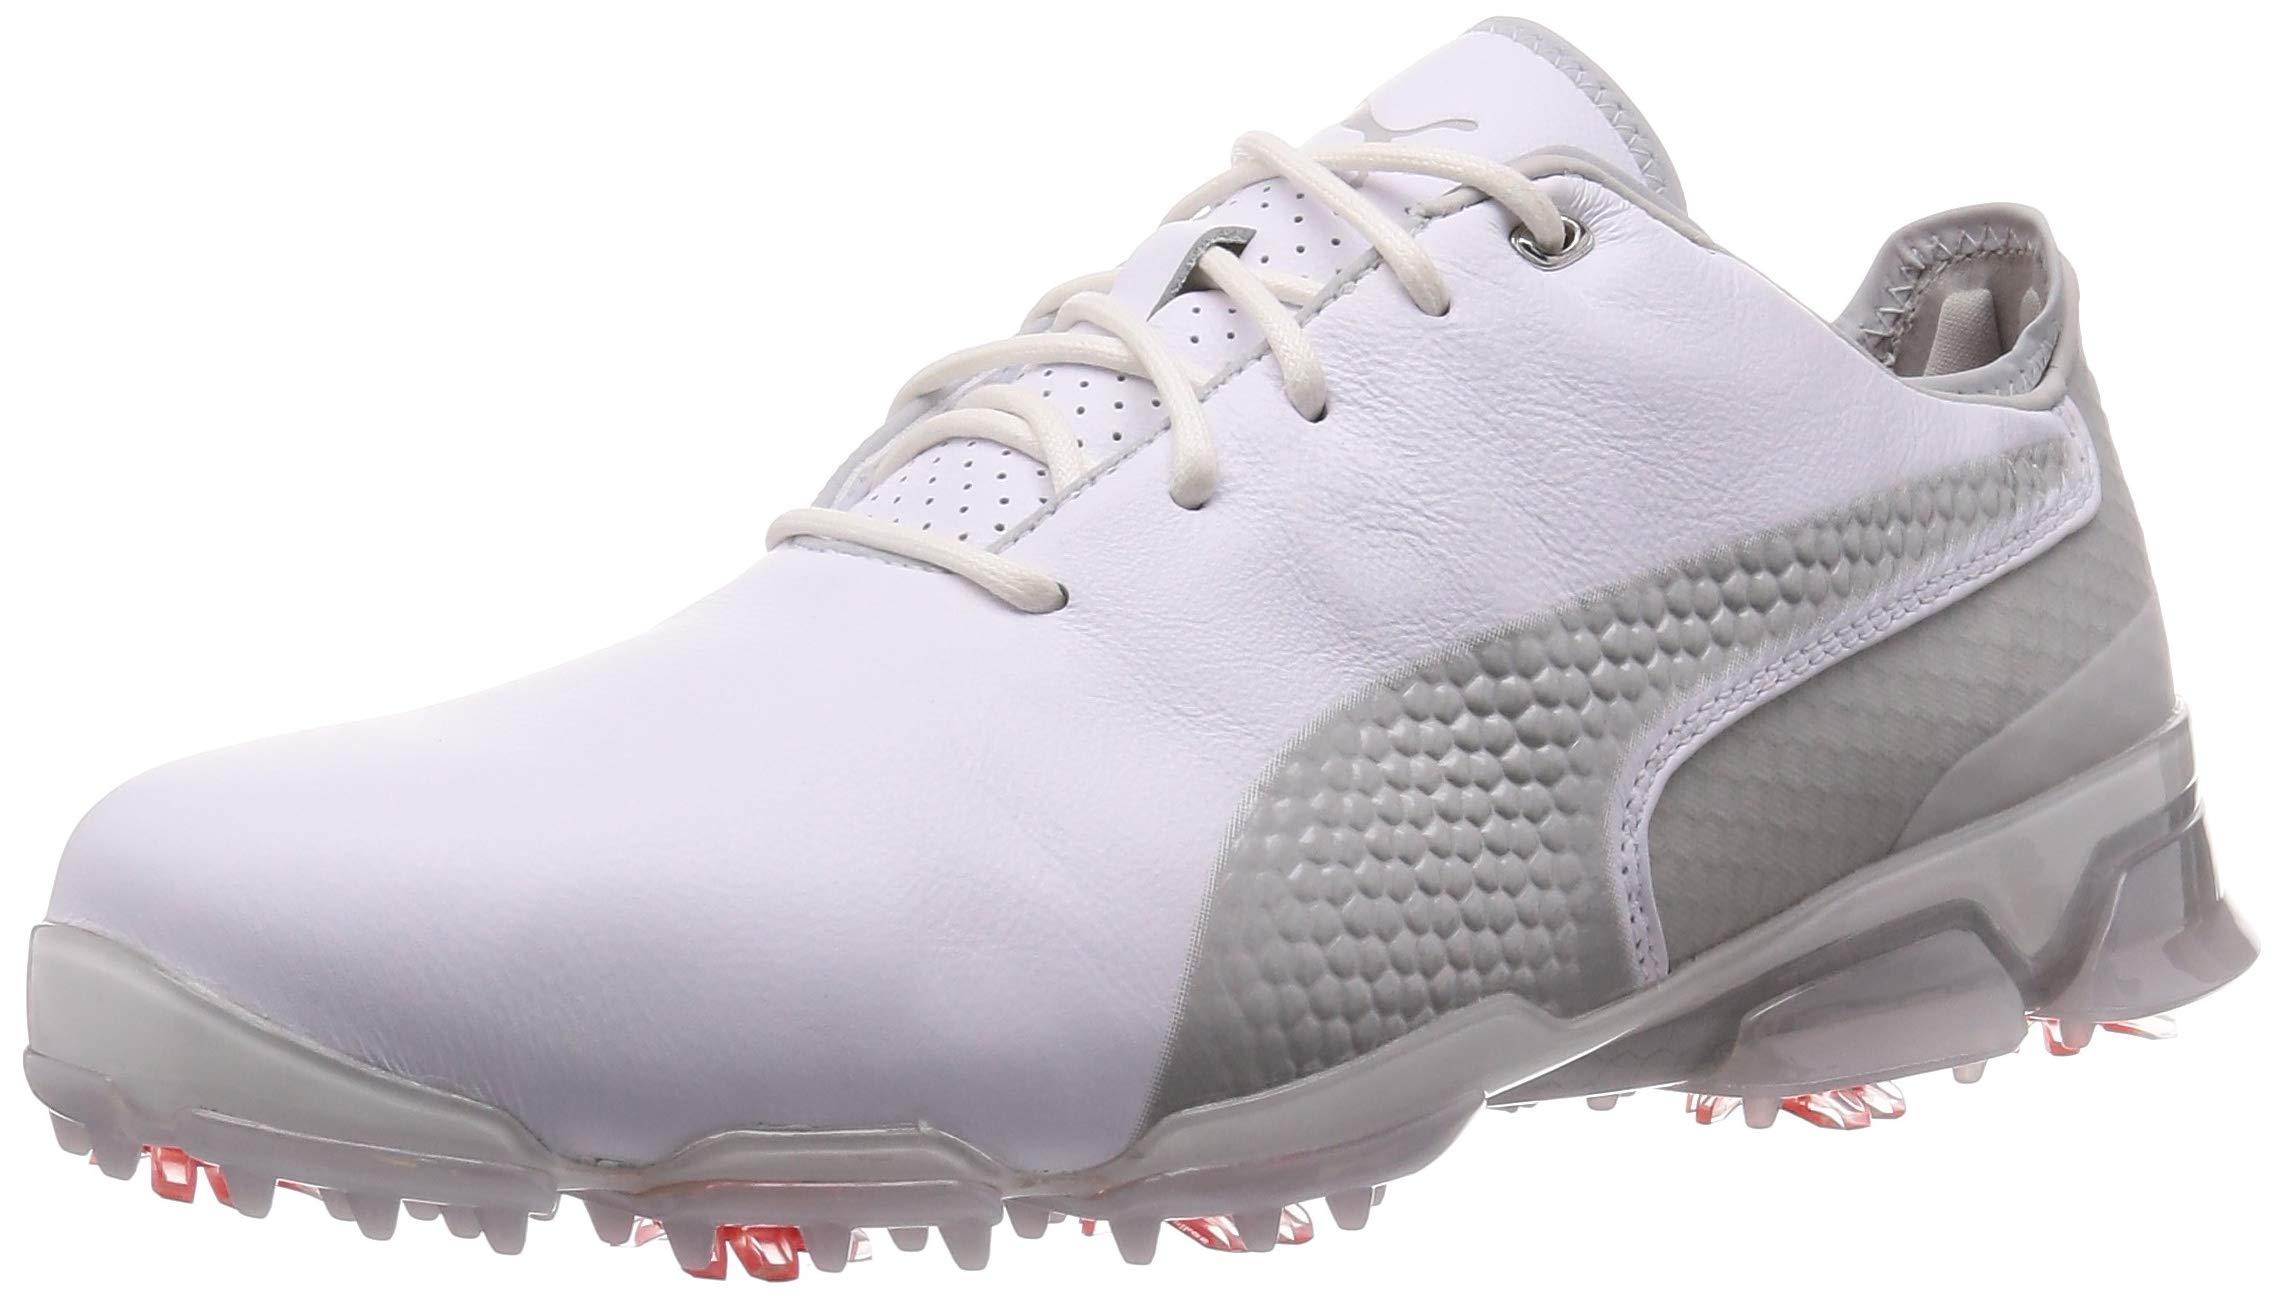 Men's Ignite PROADAPT Golf Shoe- Buy